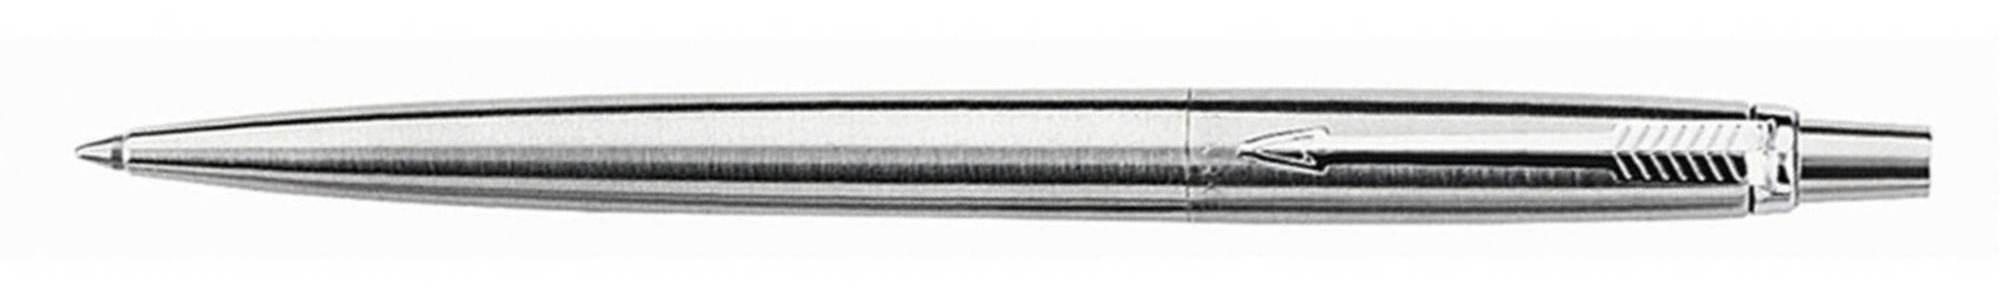 Długopis Parker JOTTER stalowy – 05102